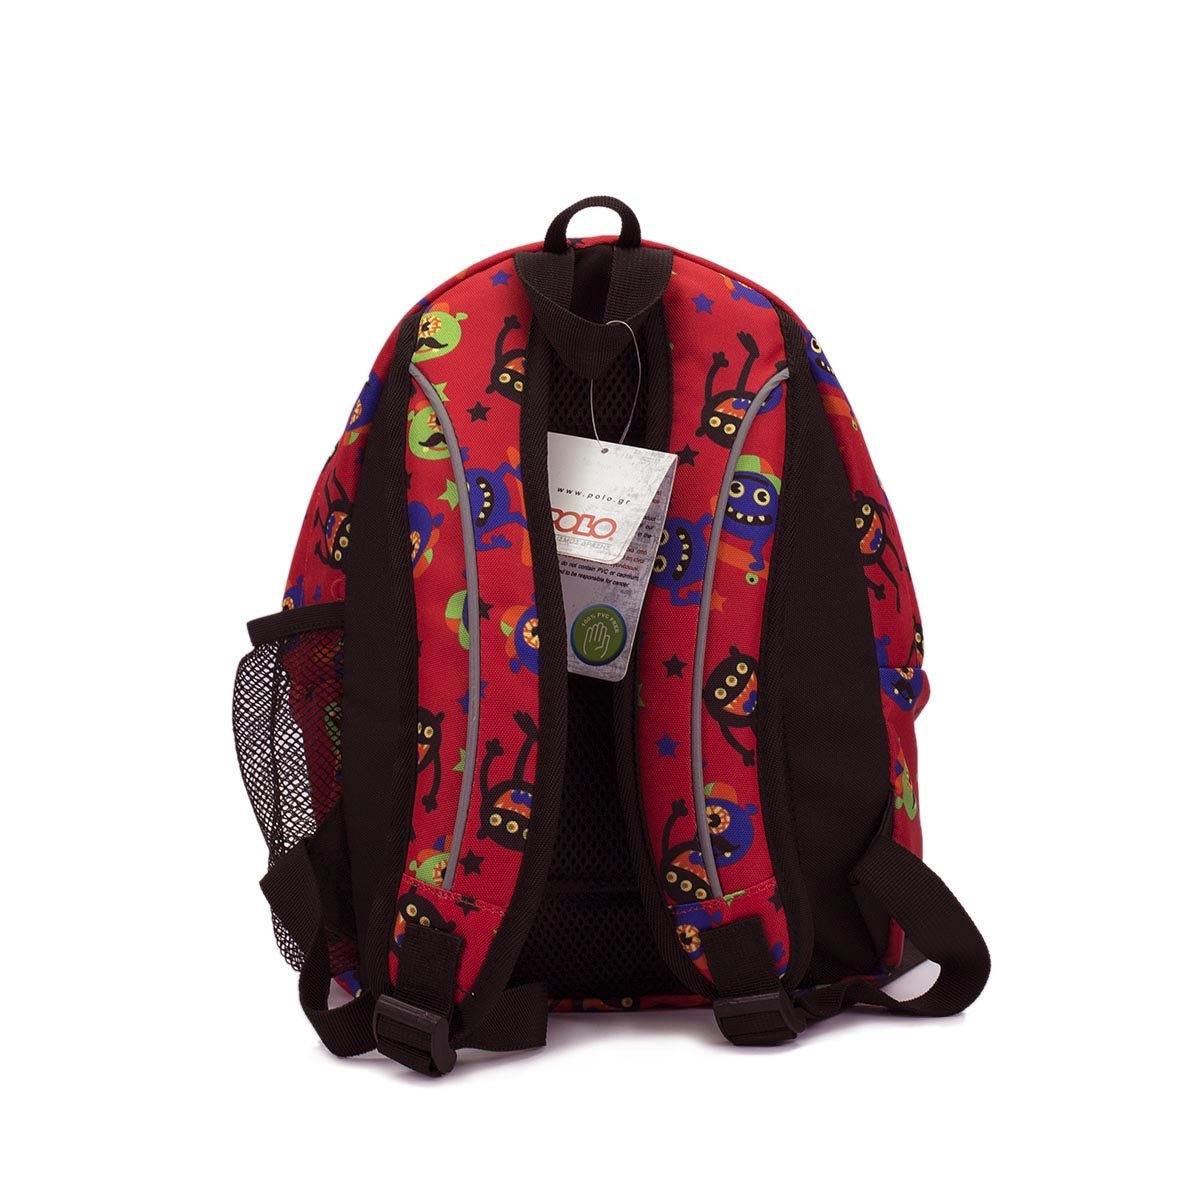 99025351bee Σχολικό Σακίδιο Πλάτης Νηπιαγωγείου Polo Backpack Mini 9-01-067-63 Κόκκινο